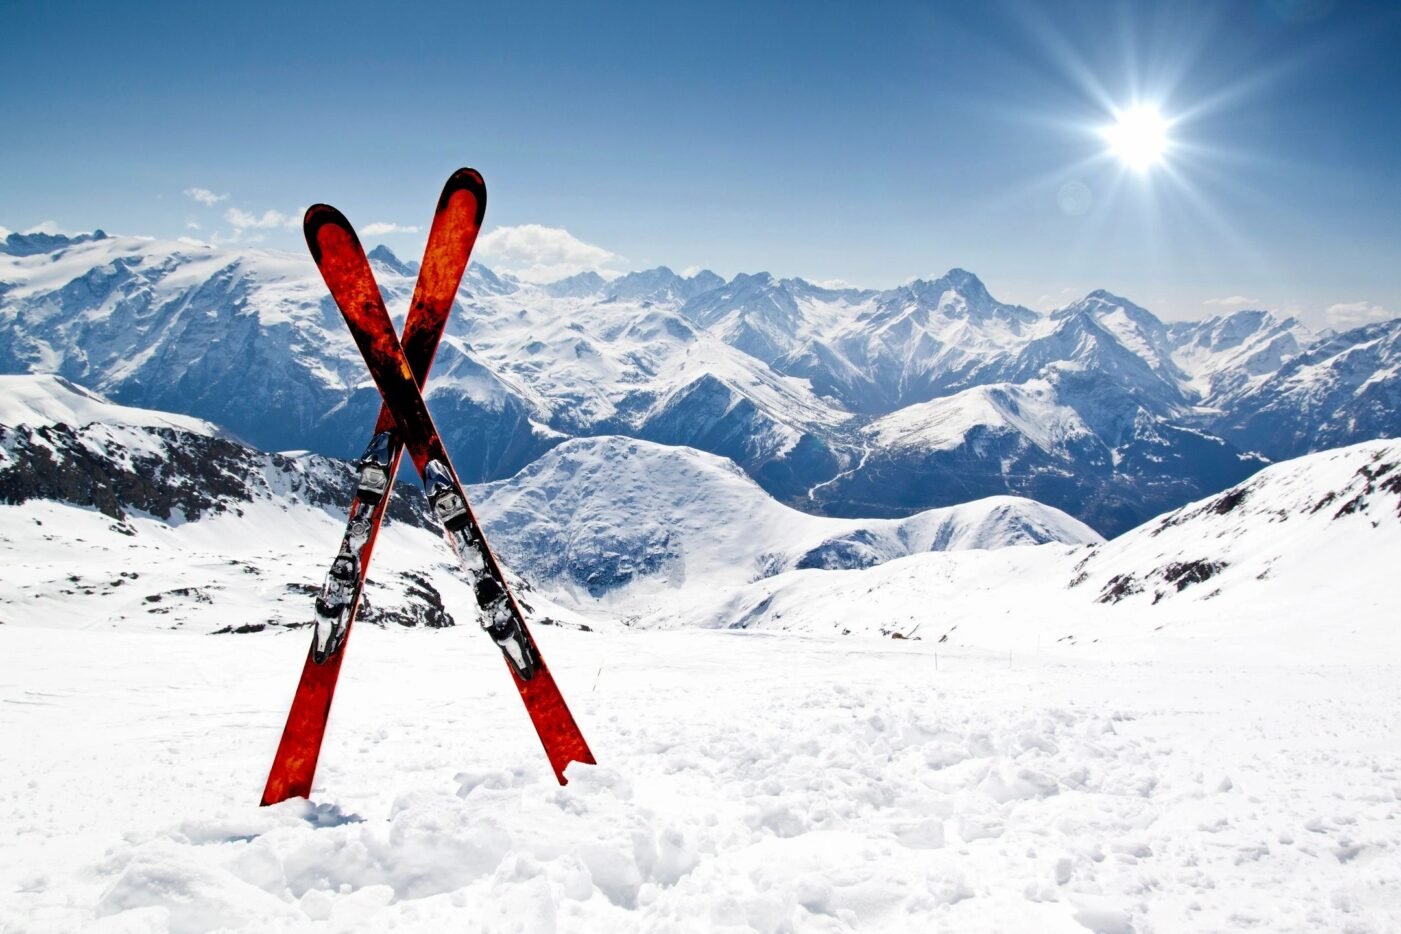 ski-panorama-theresa-longo